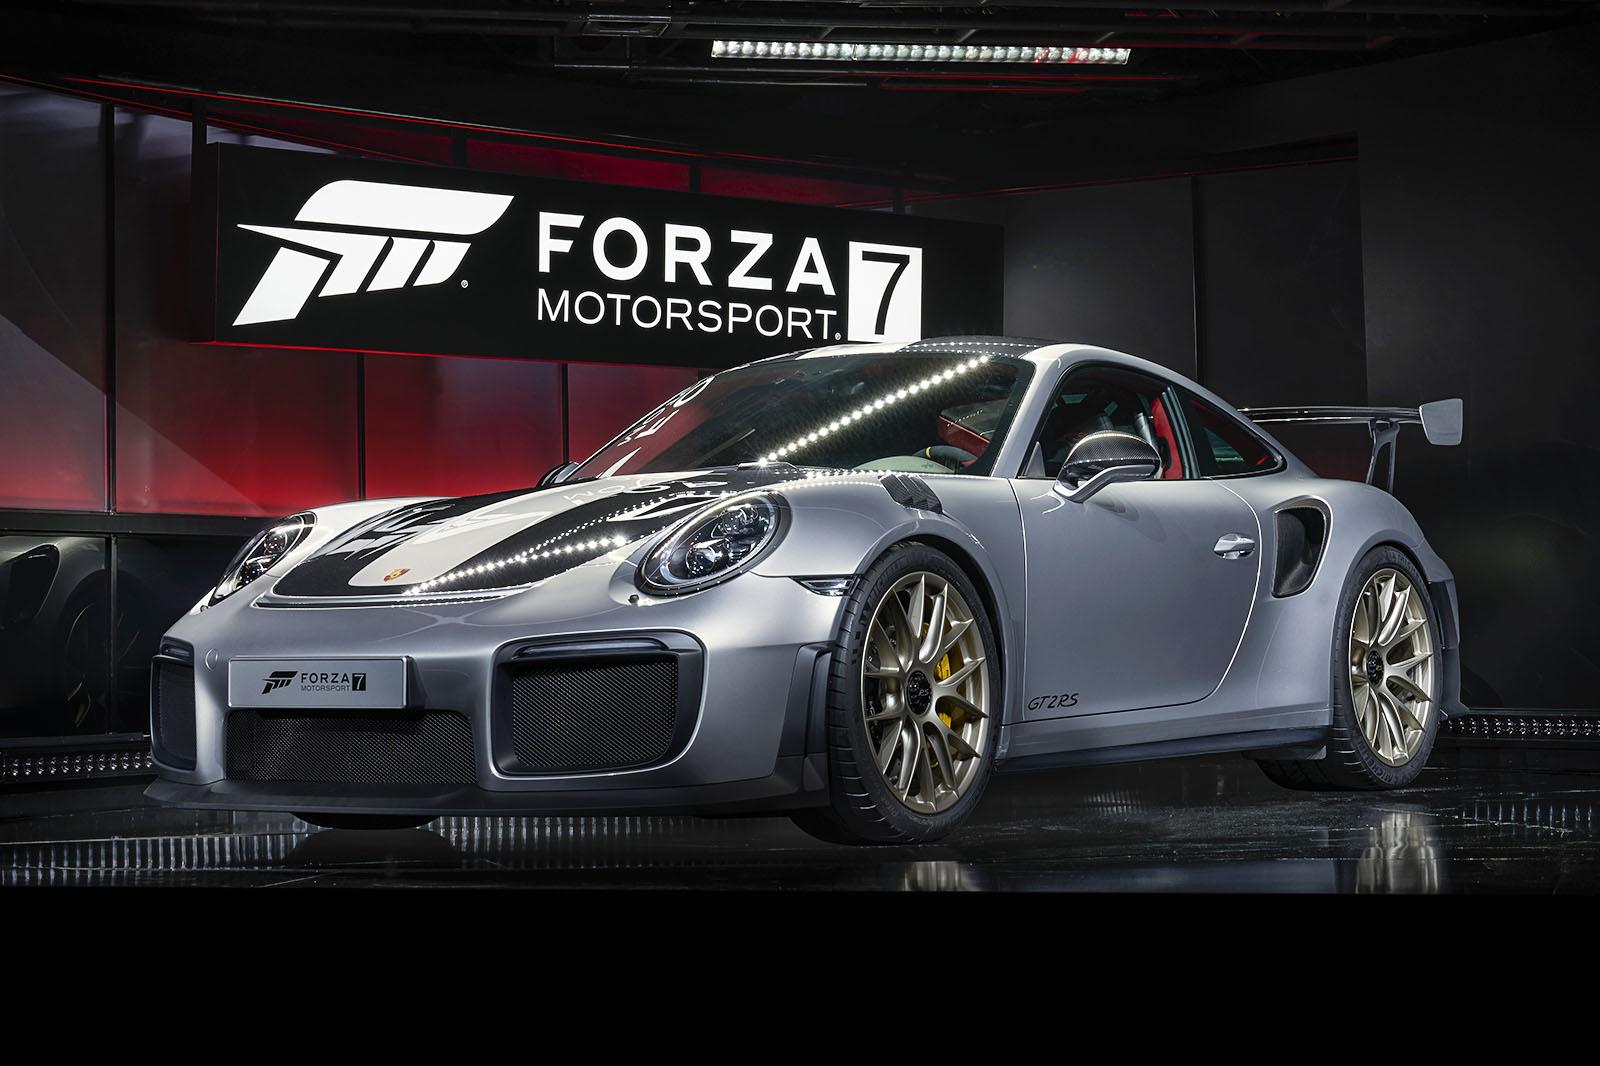 700bhp Porsche 911 GT2 RS — новые фотографии и видео Nürburgring